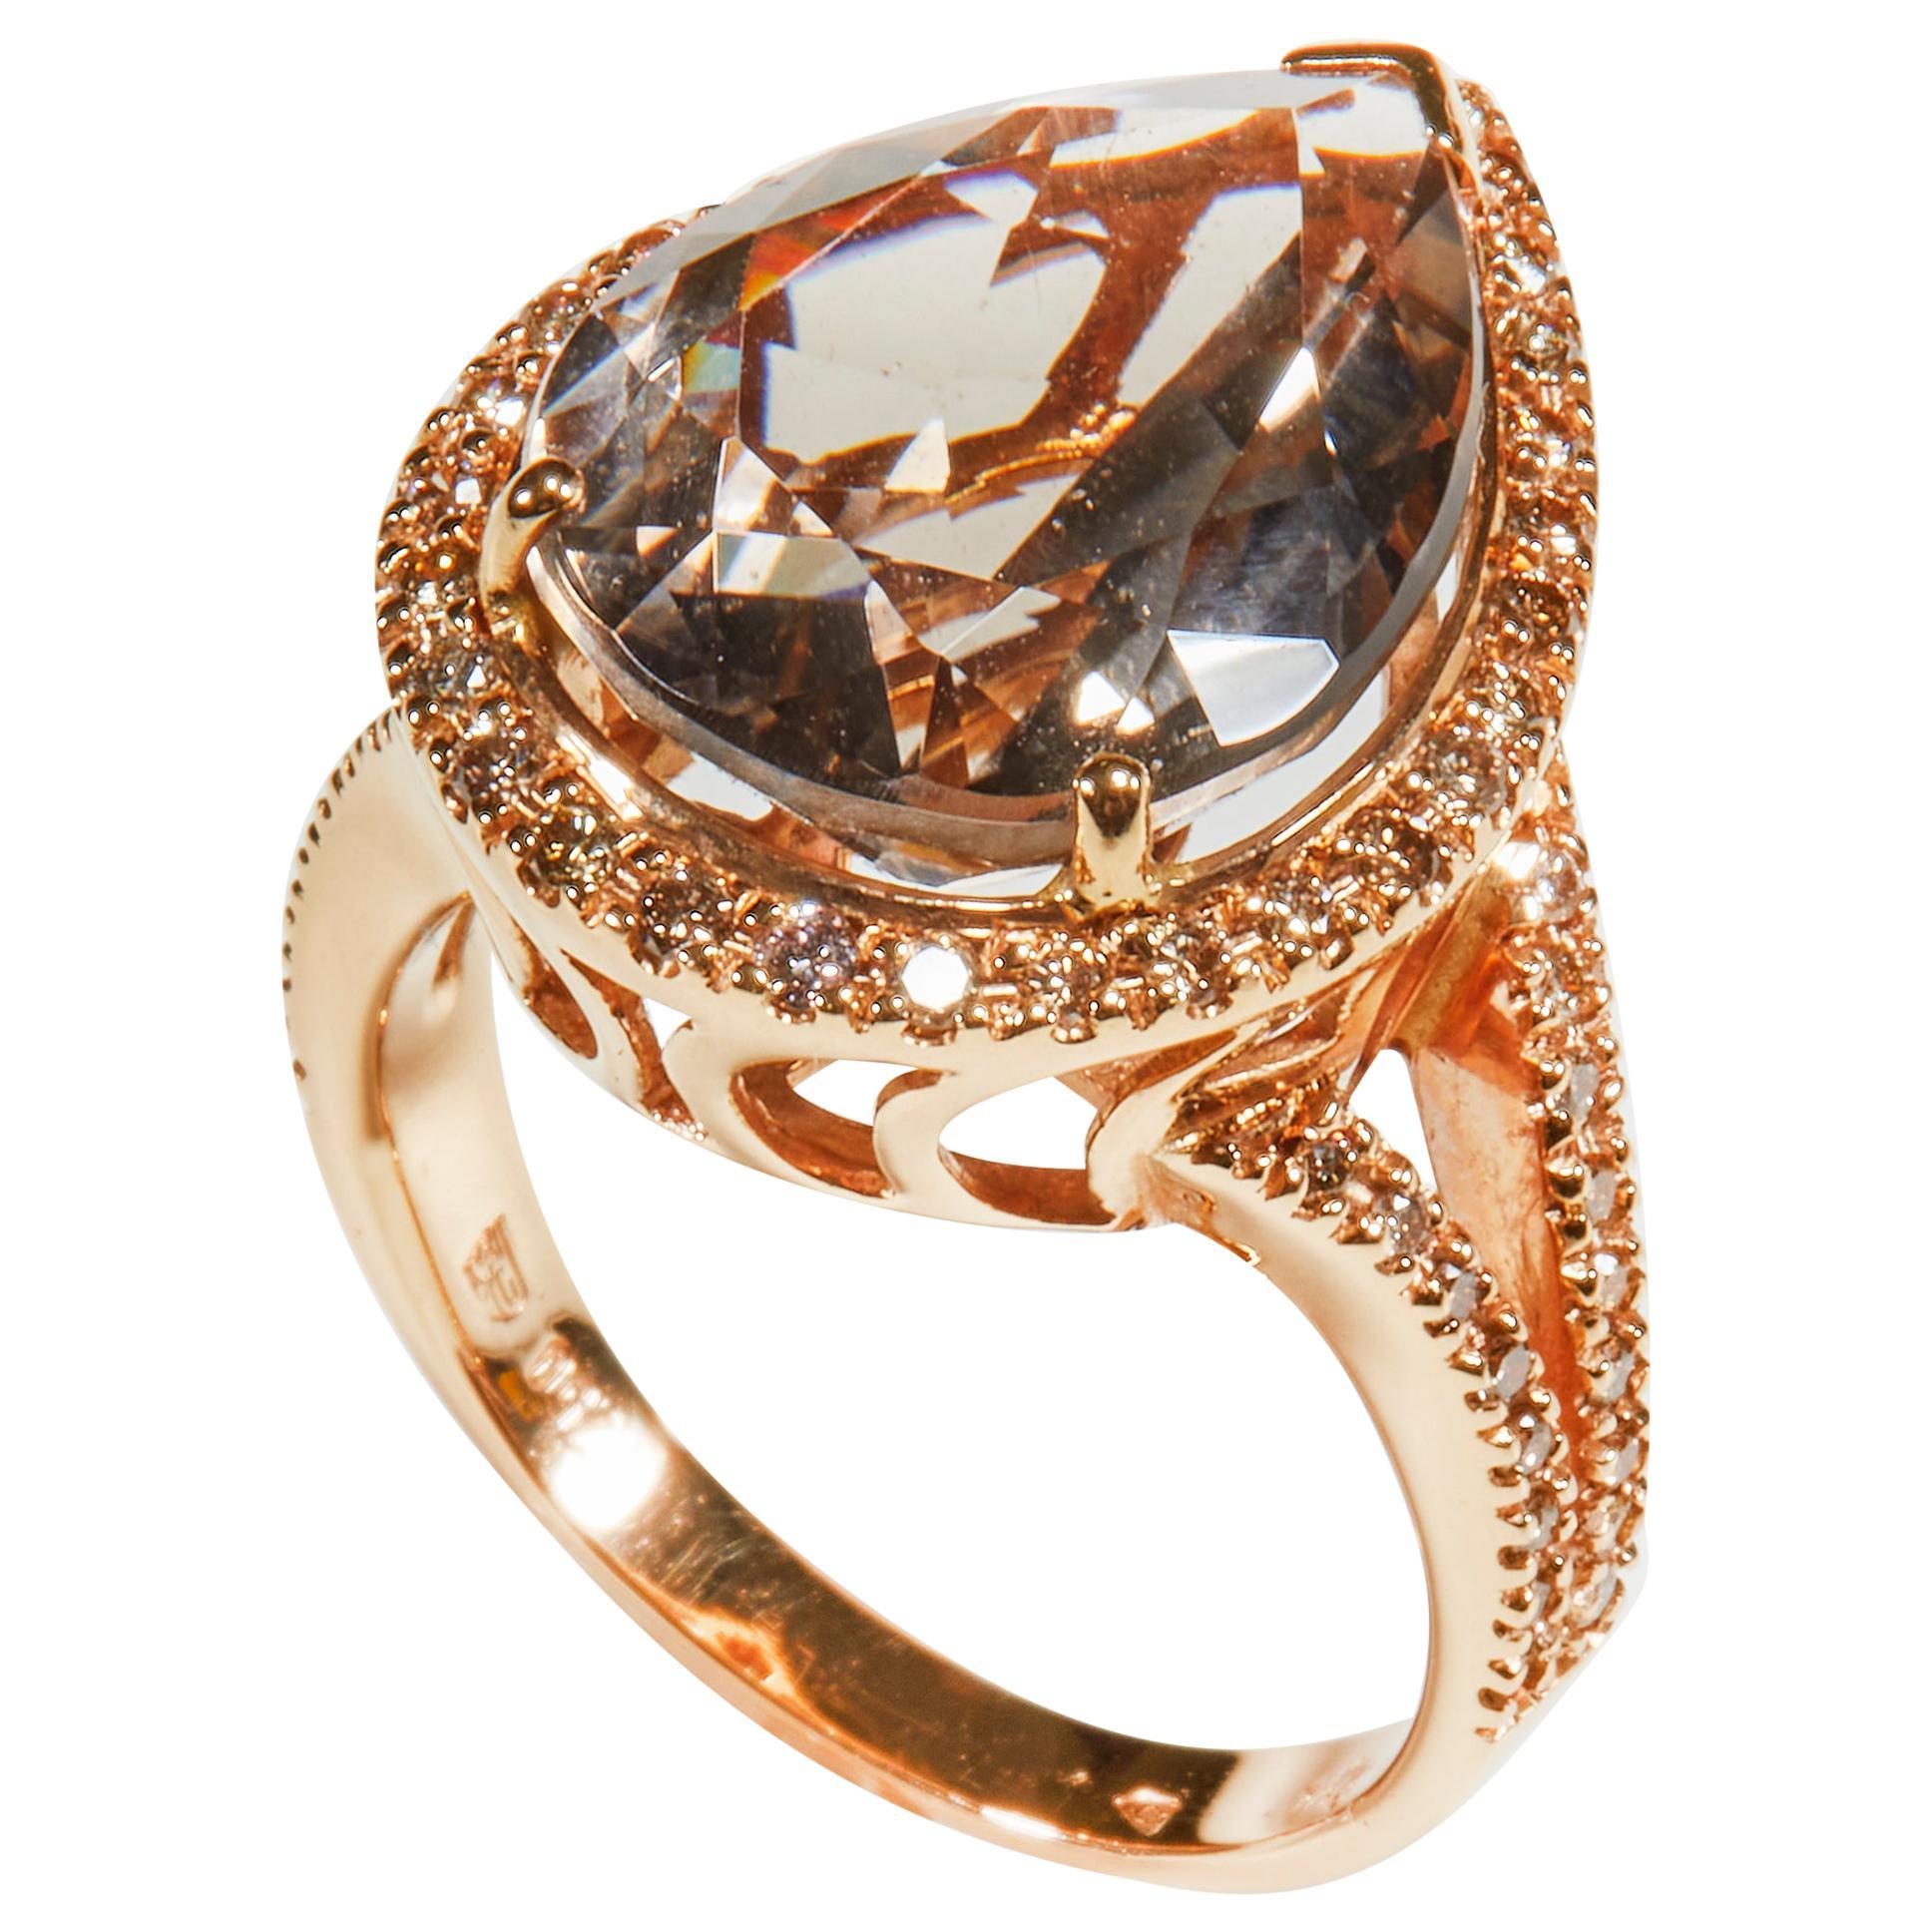 18 Karat Rose Gold Cognac Diamond and Smoky Quartz Cocktail Ring